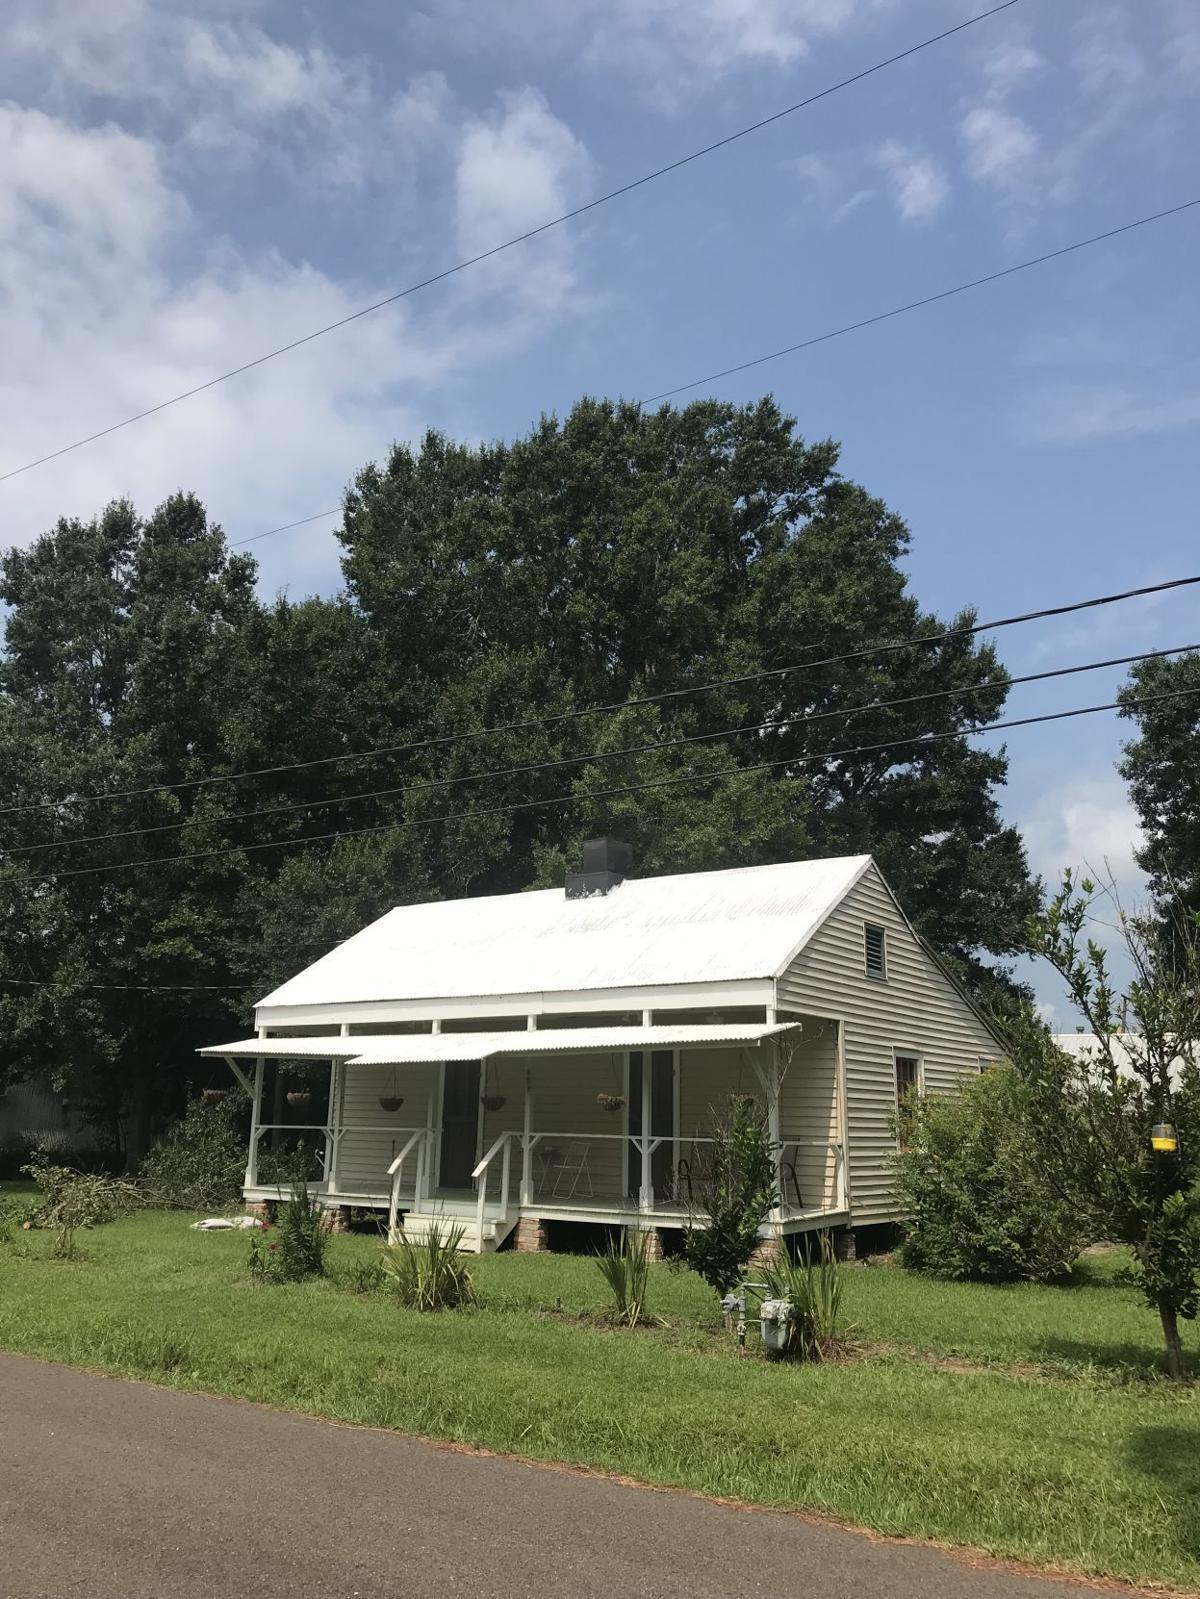 458 Orange Cottage, Laplace, St. John the Baptist Parish, 70068